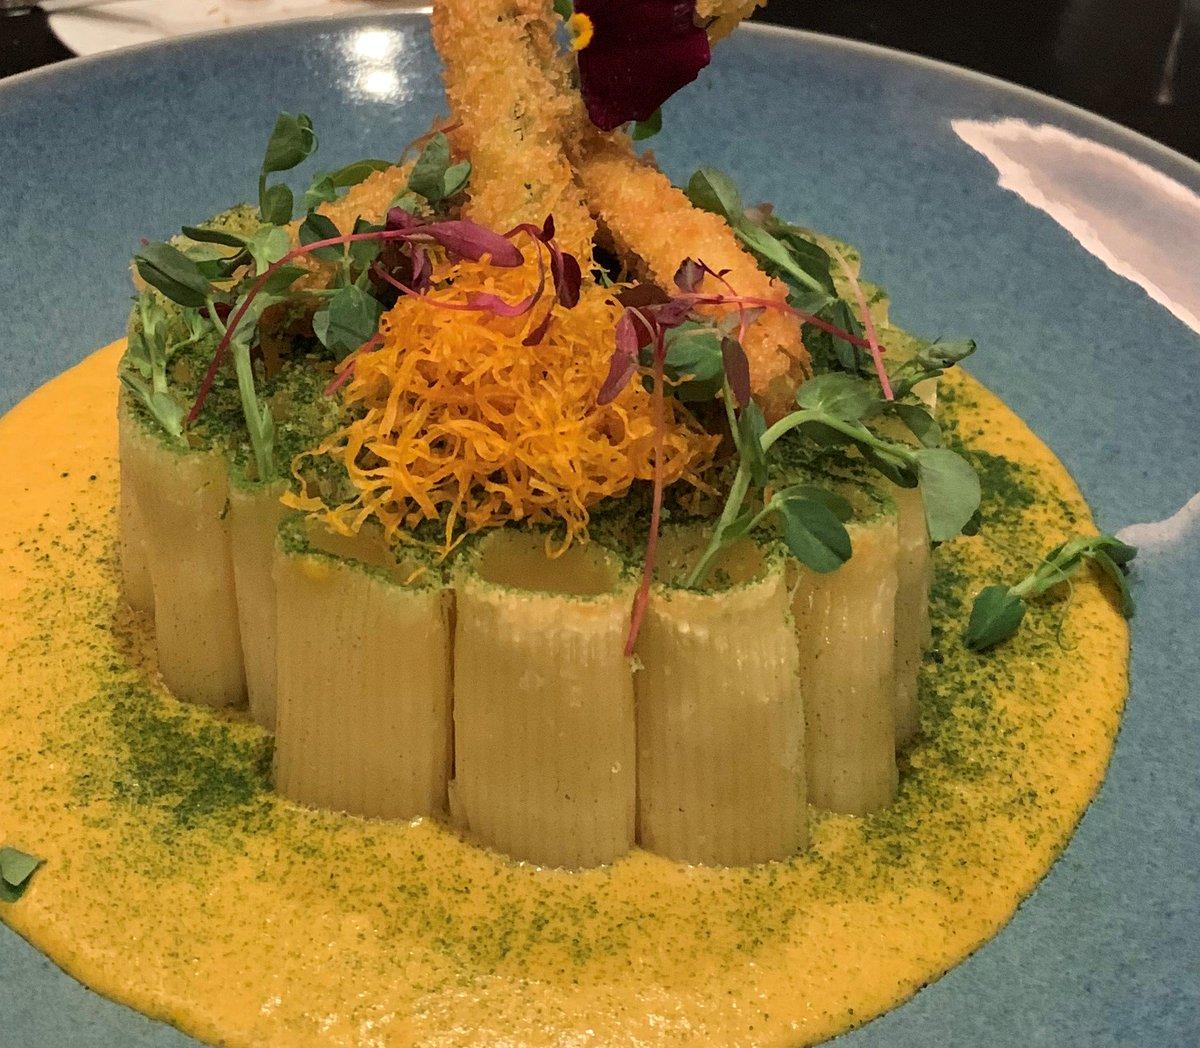 A macaroni cheese fit for a president @crowneplazaldn POTUS Restaurant #vsukvisits #londonhotels #newlondonrestaurants